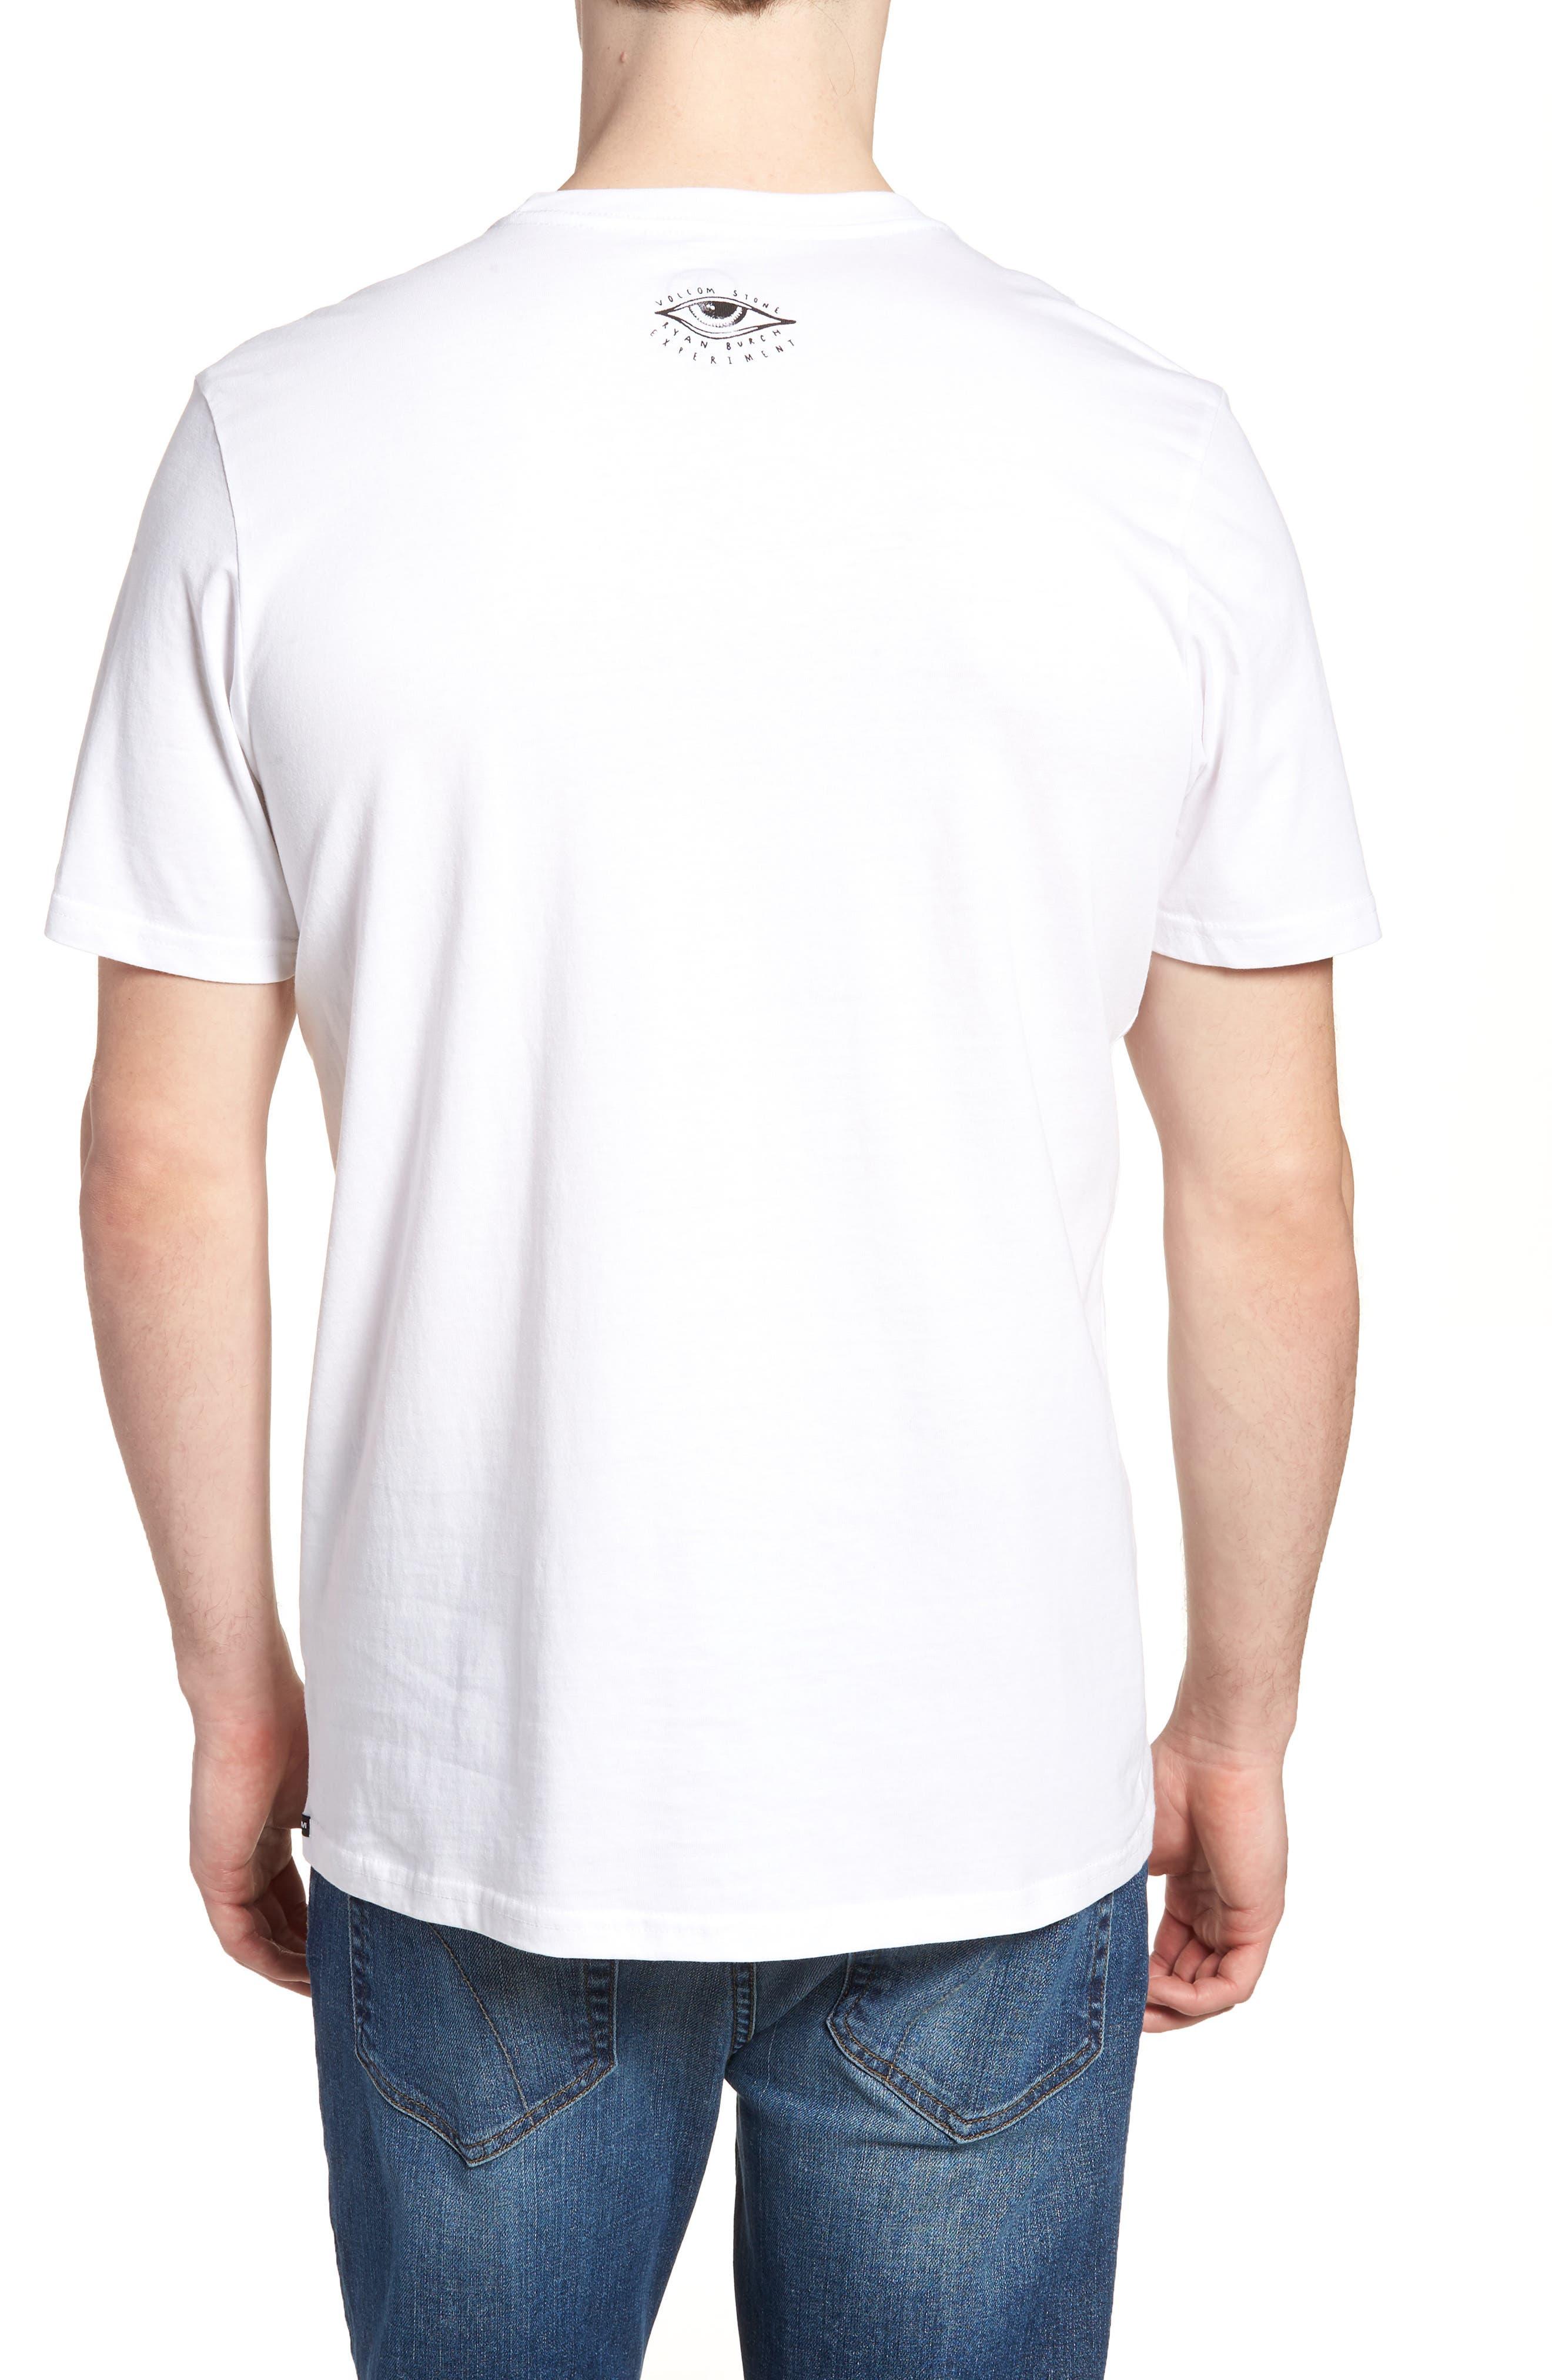 Burch Foam Graphic T-Shirt,                             Alternate thumbnail 2, color,                             100